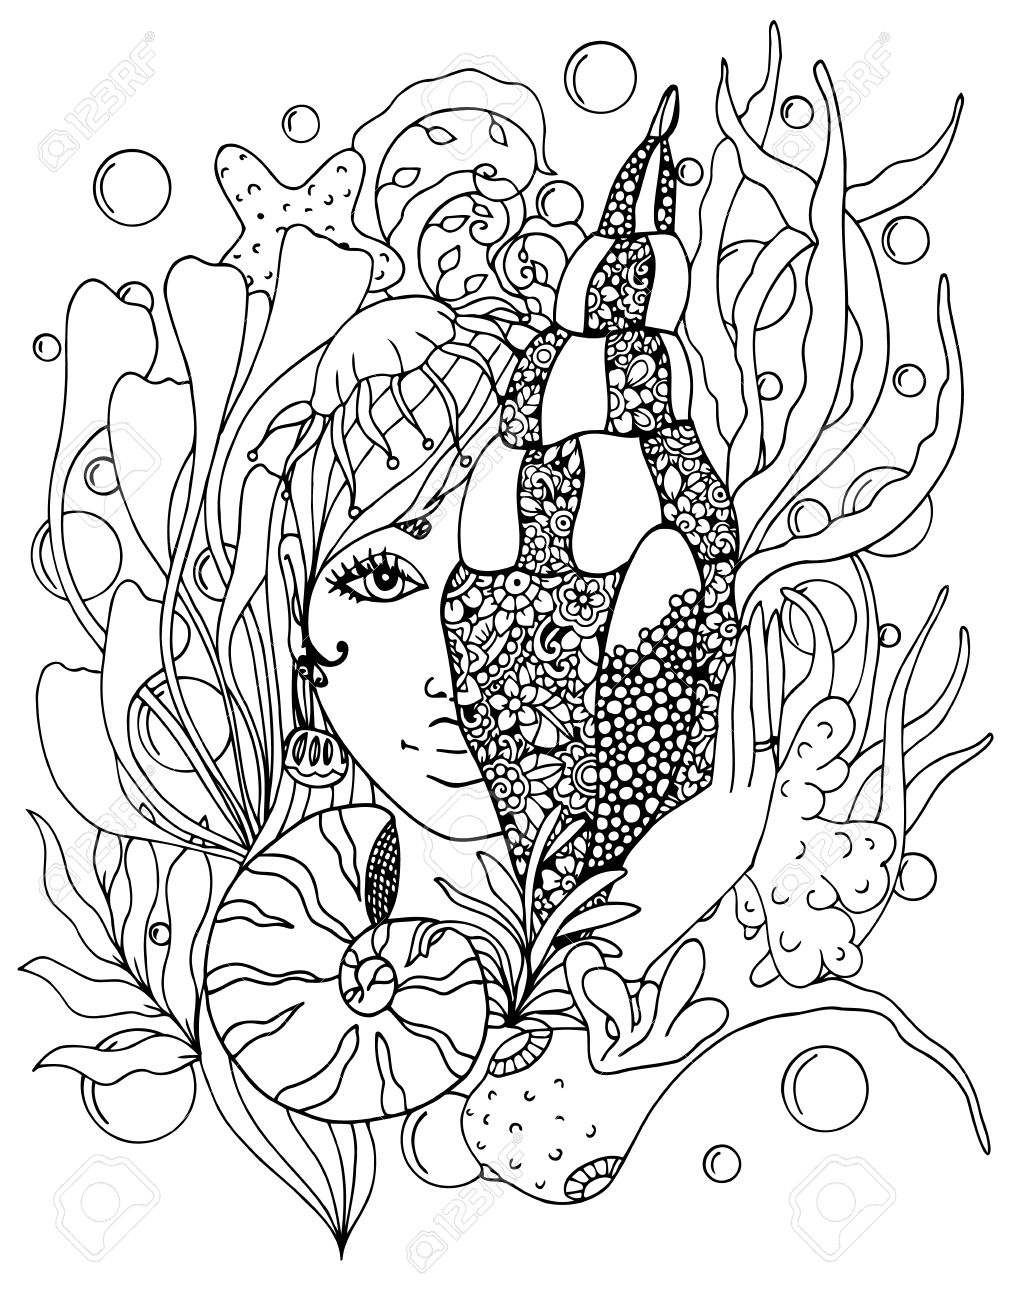 Vektor-Illustration Zentangl Mädchen Mit Shell Im Ozean. Doodle ...